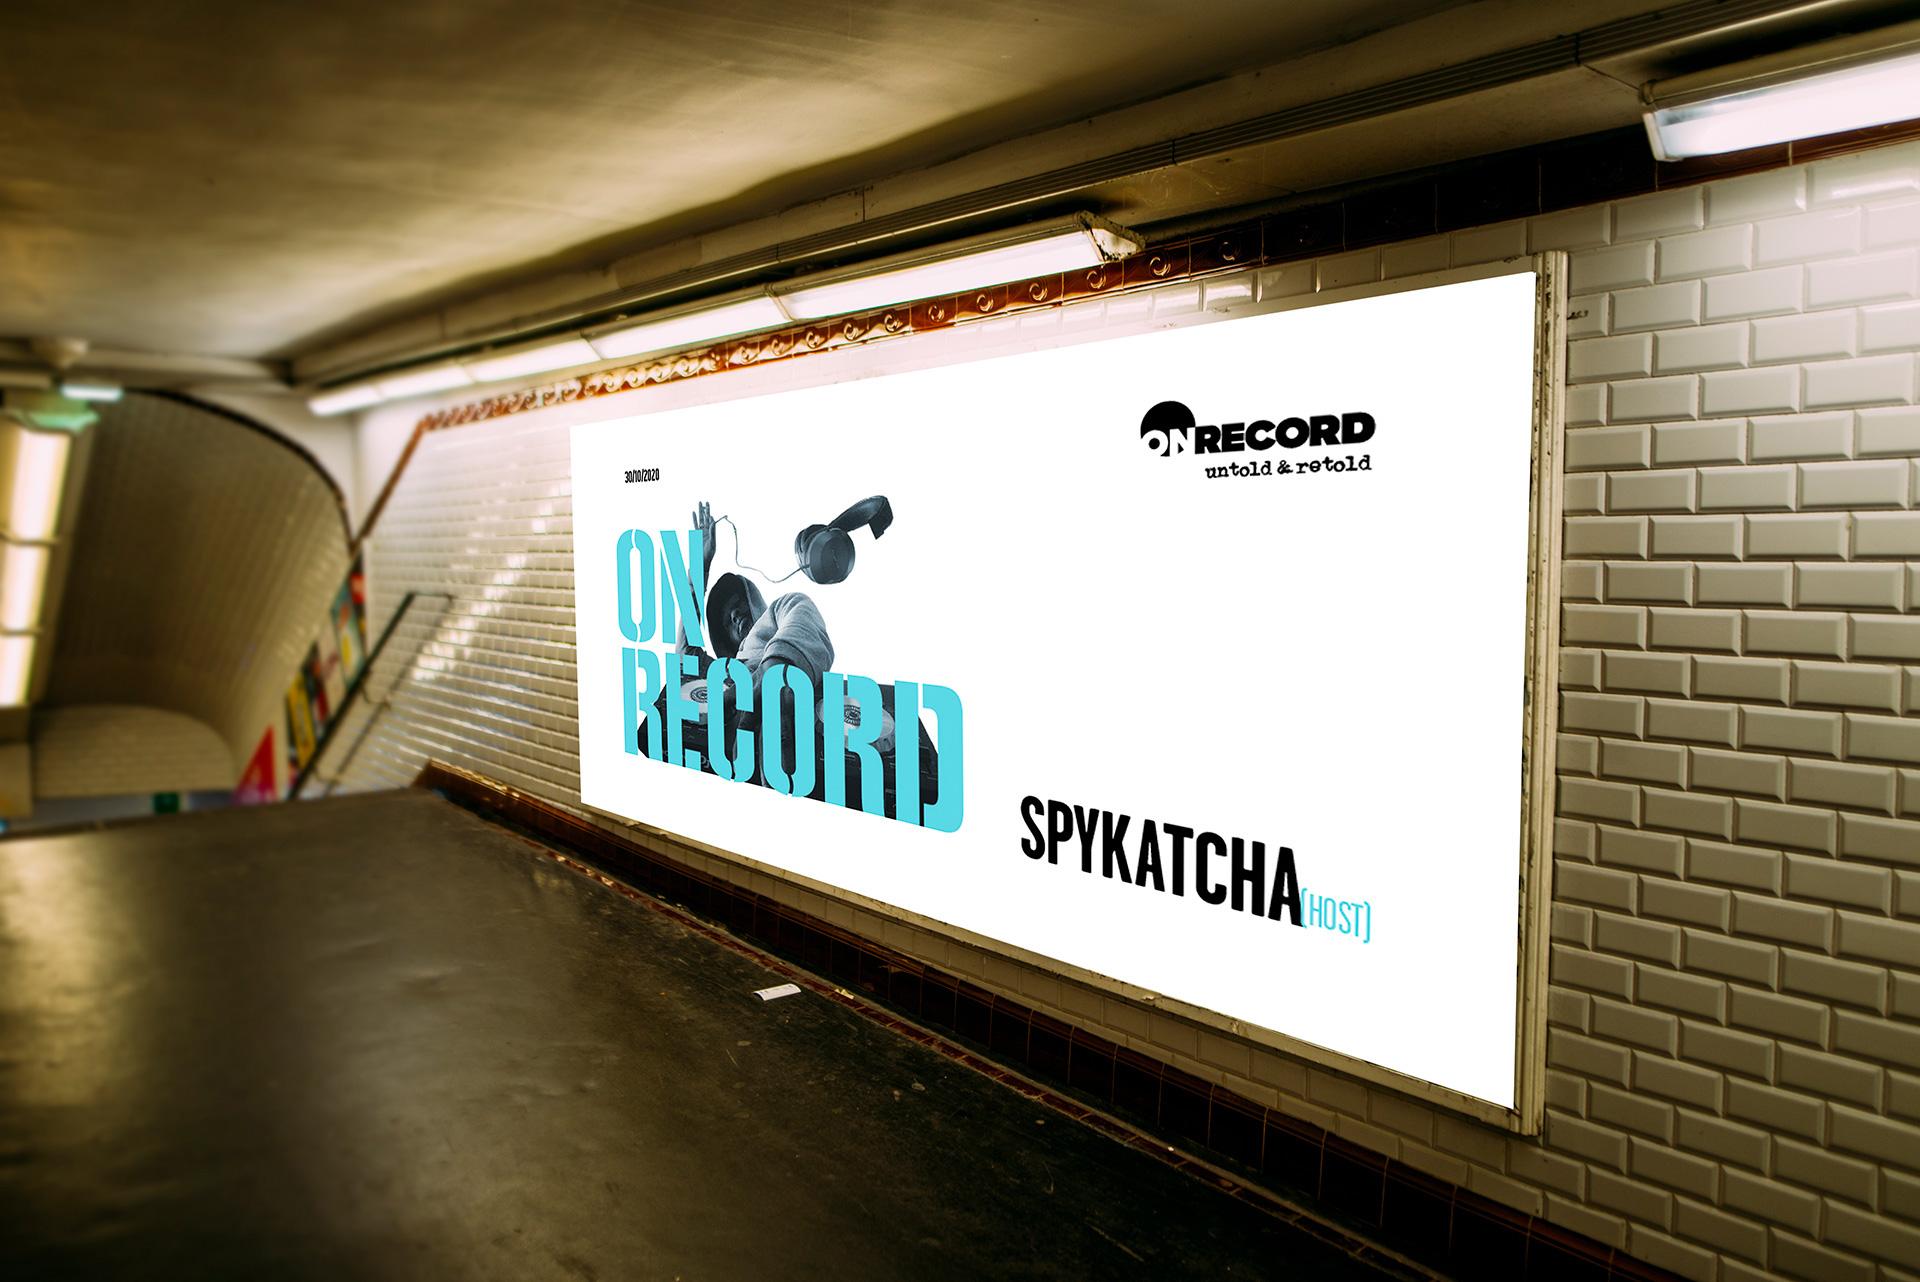 on record train advert